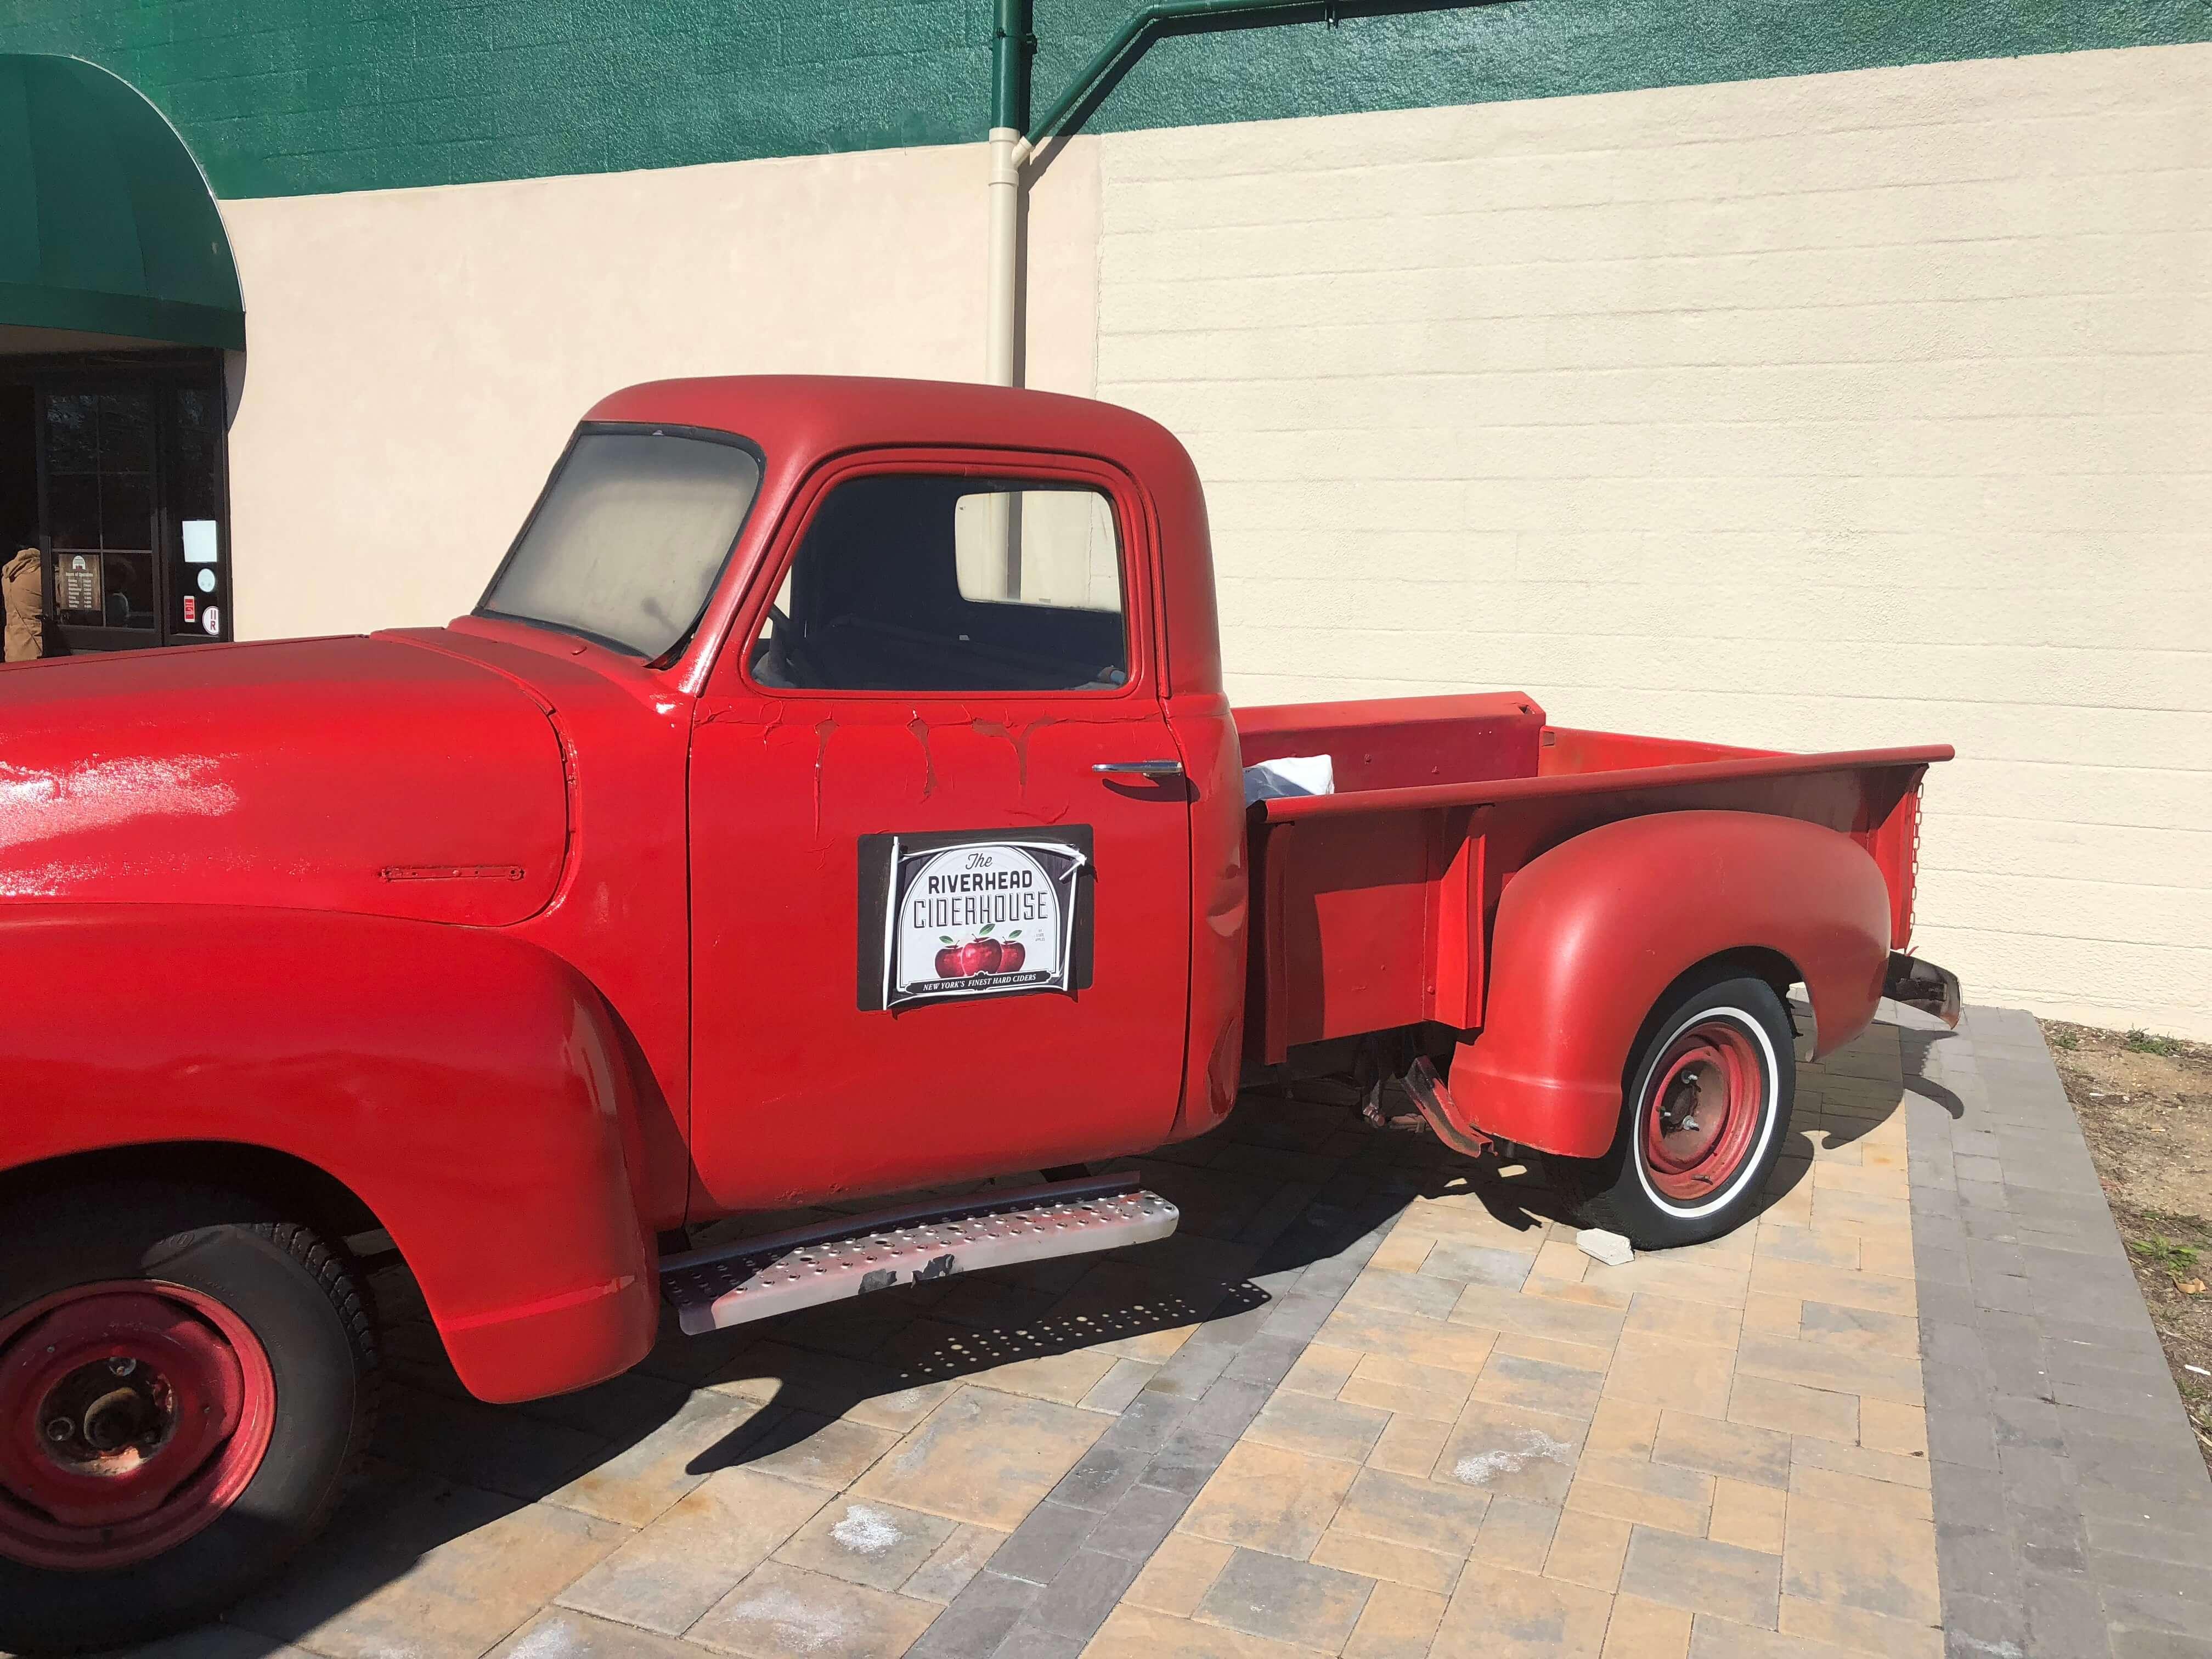 red car The Riverhead Ciderhouse